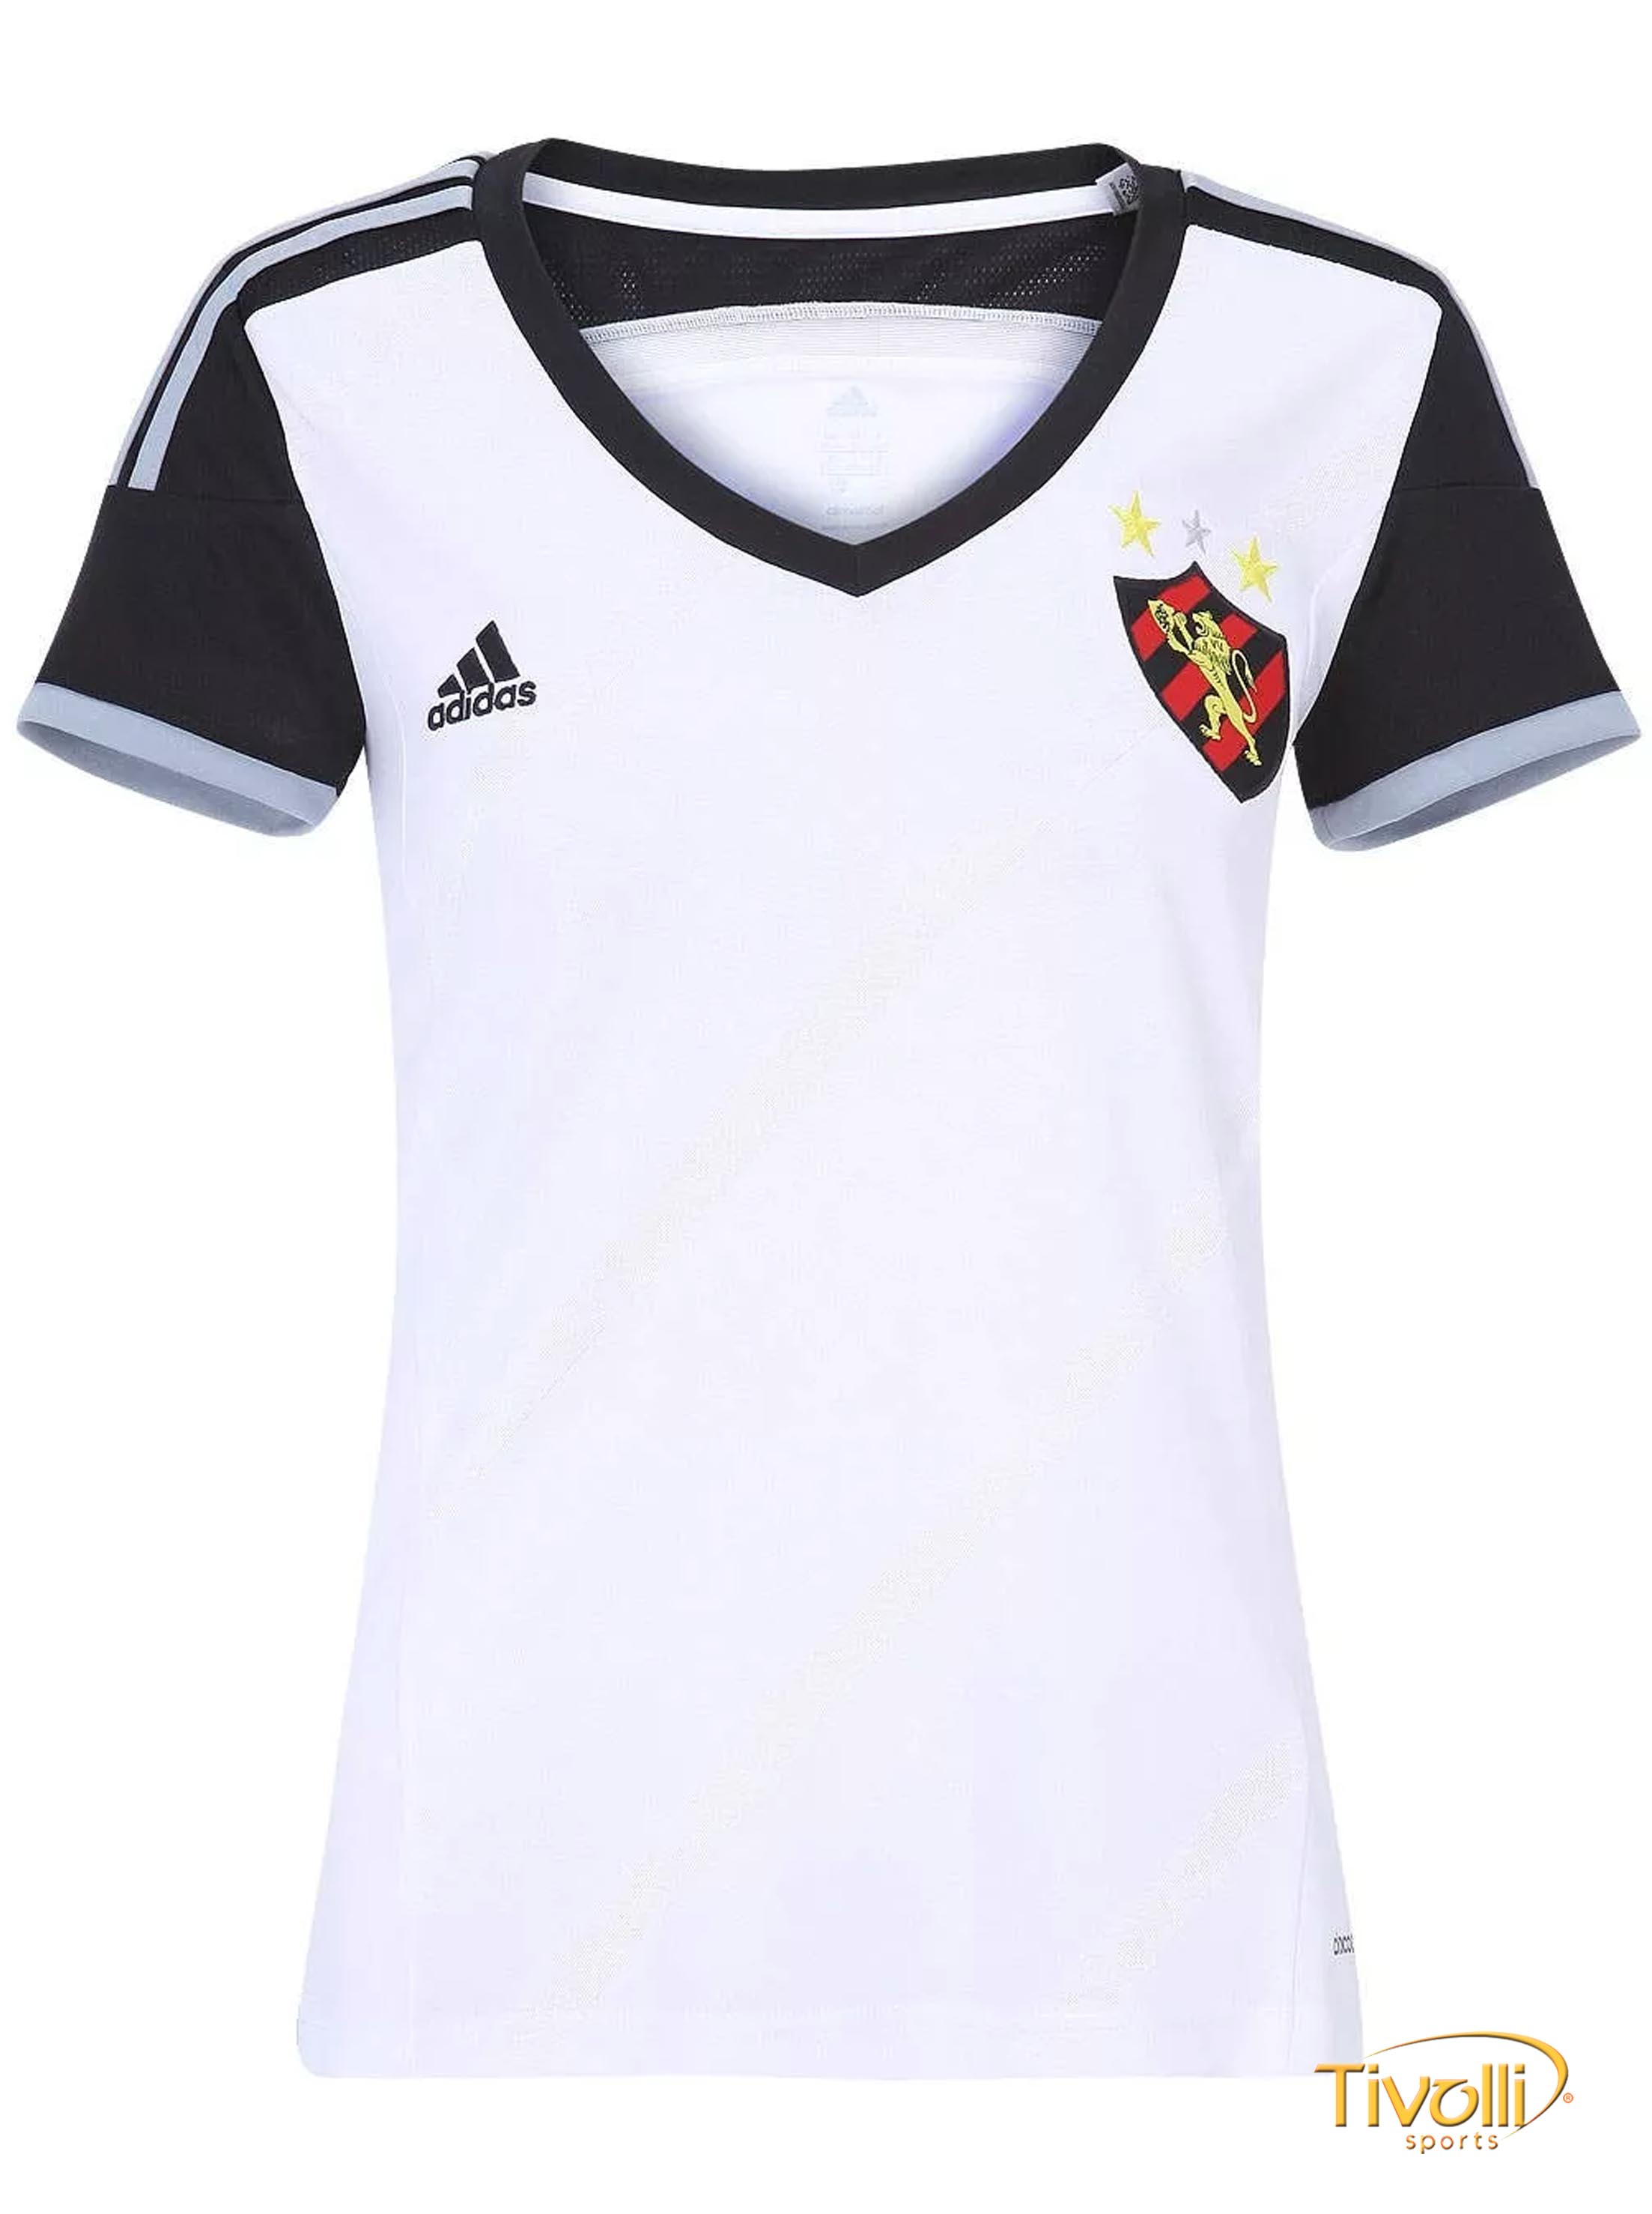 62786ea70 Camisa Club Sport Recife II Feminina 2014 Adidas > - Mega Saldão >